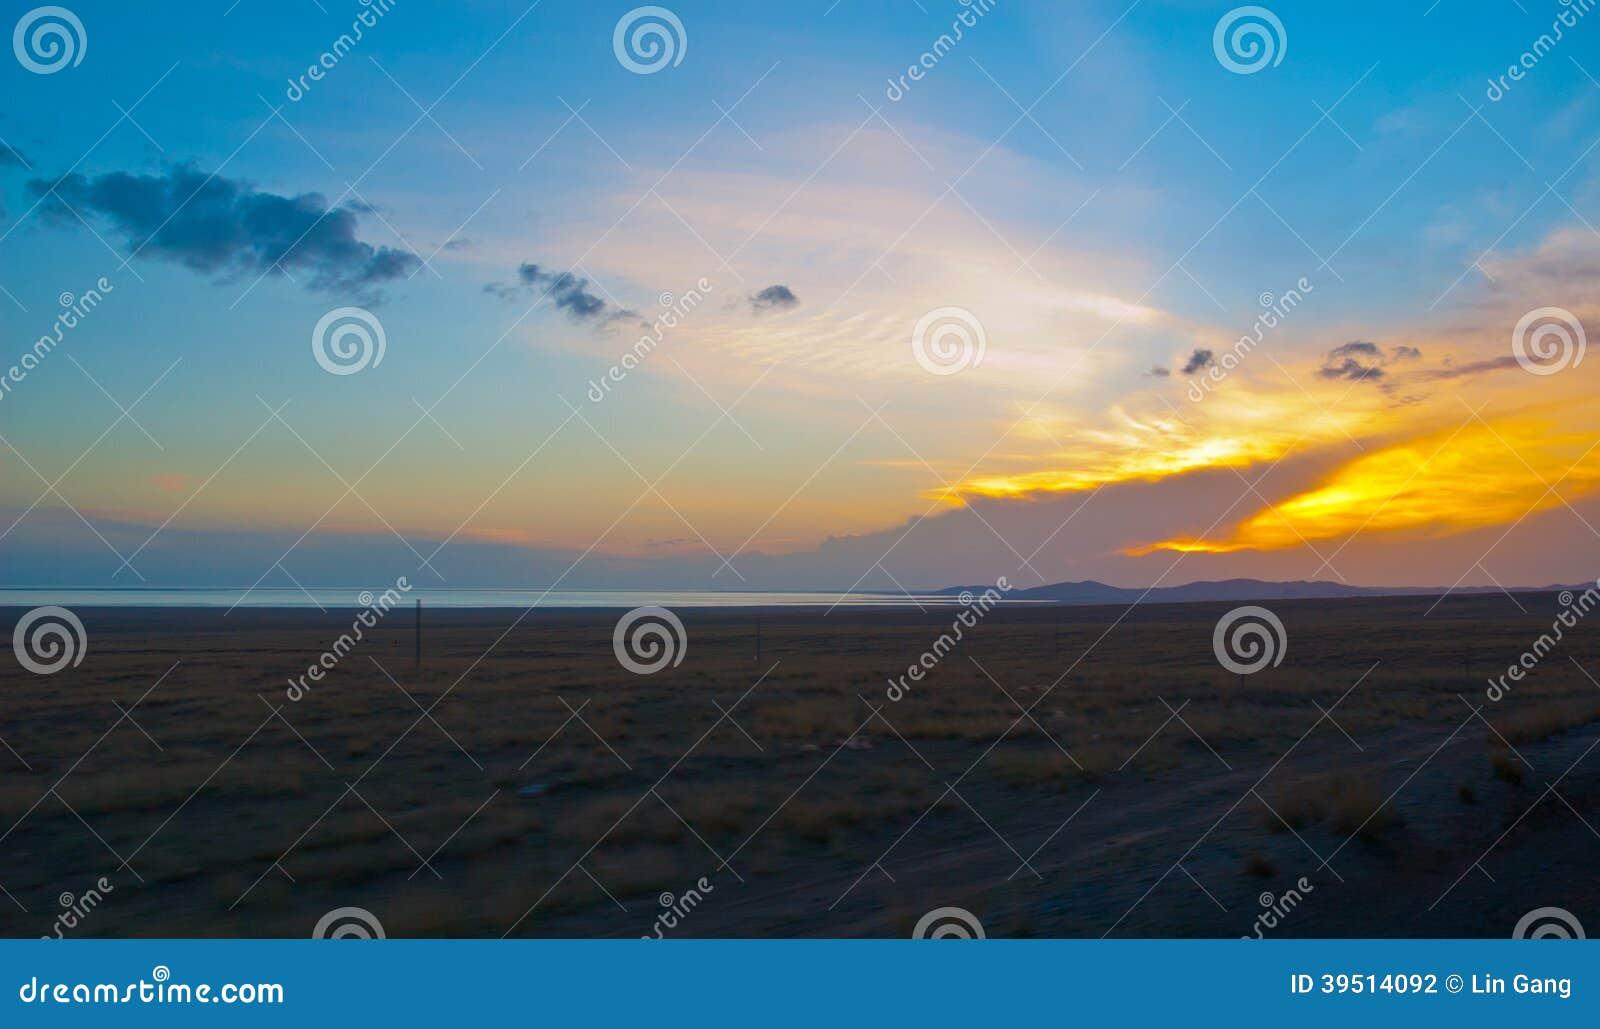 Tibetan plateau-Evening sky on the Qinghai Lake bank